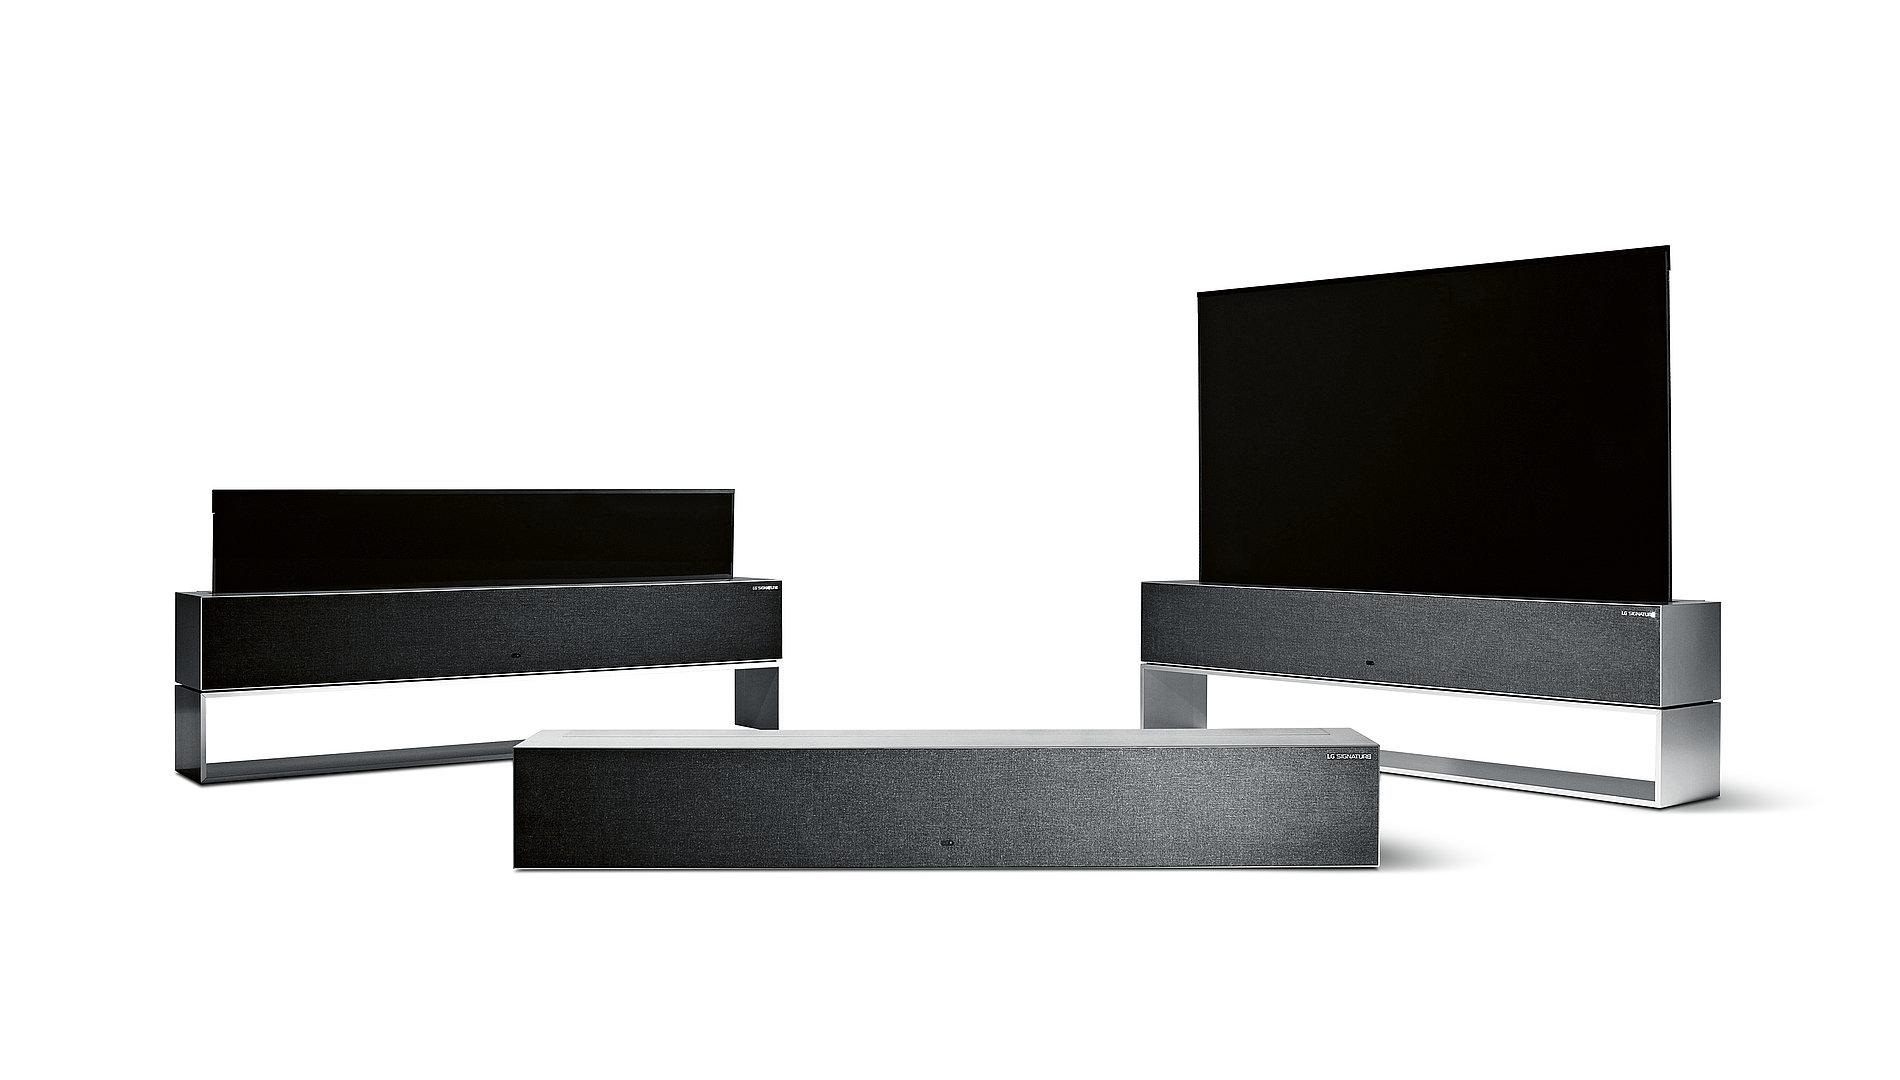 LG Signature R9 | Red Dot Design Award